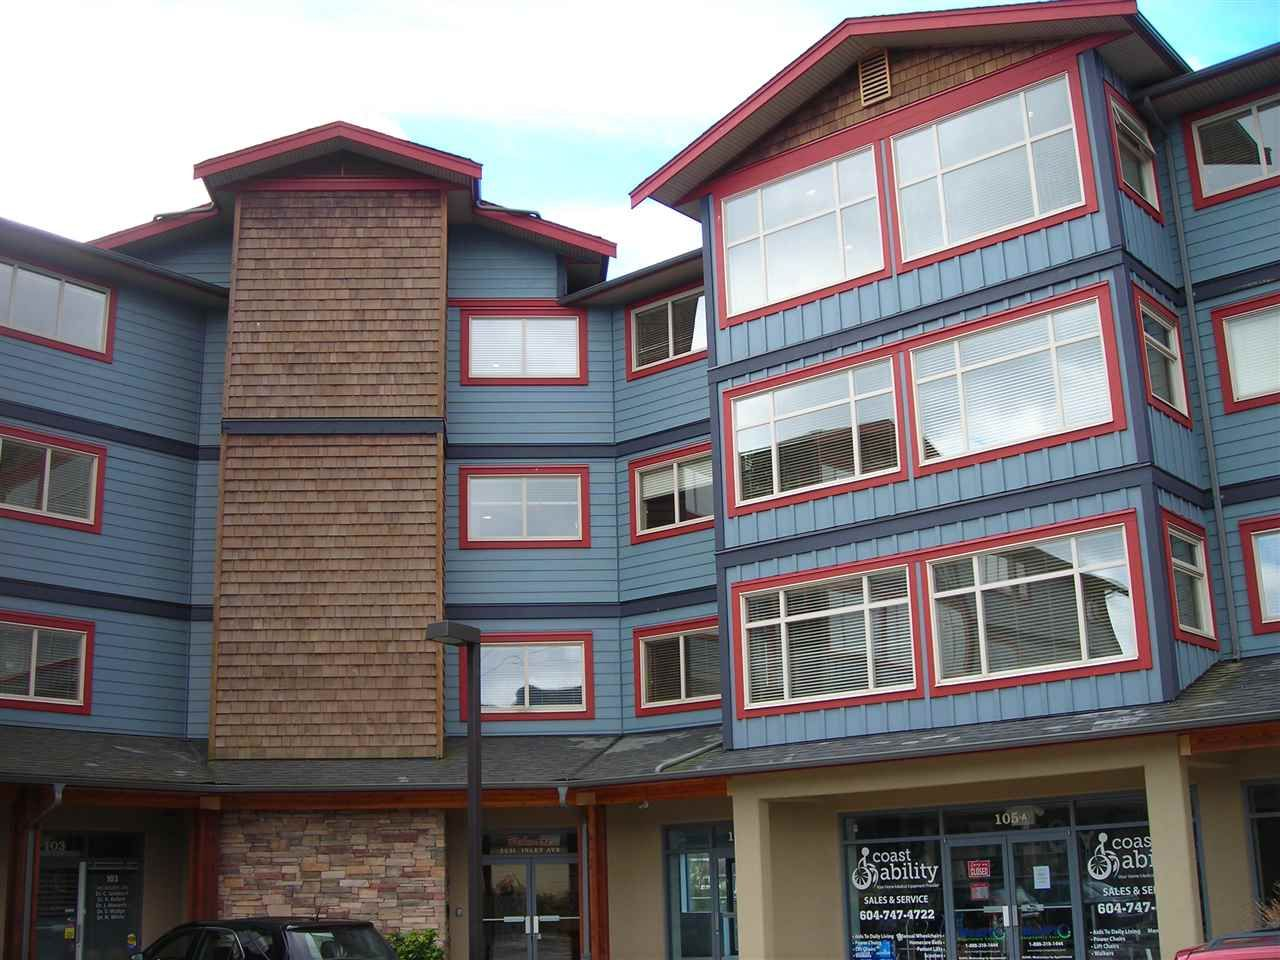 Main Photo: 406 5631 INLET Avenue in Sechelt: Sechelt District Condo for sale (Sunshine Coast)  : MLS®# R2118264